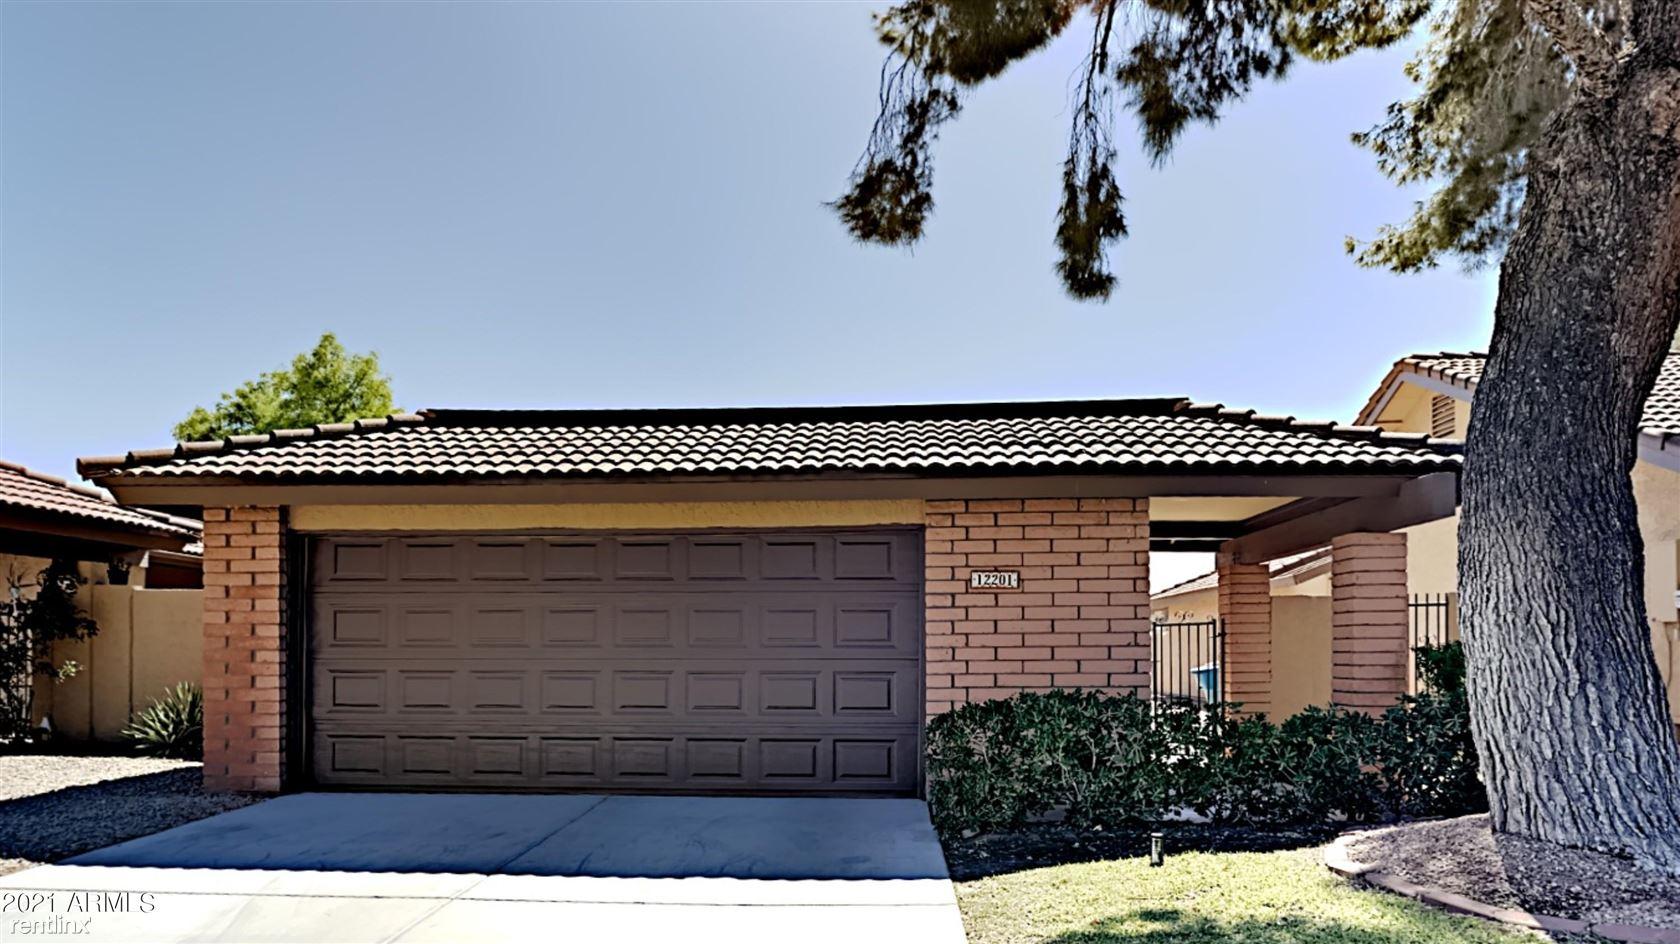 12201 S PAIUTE Street, Phoenix, AZ - 2,325 USD/ month